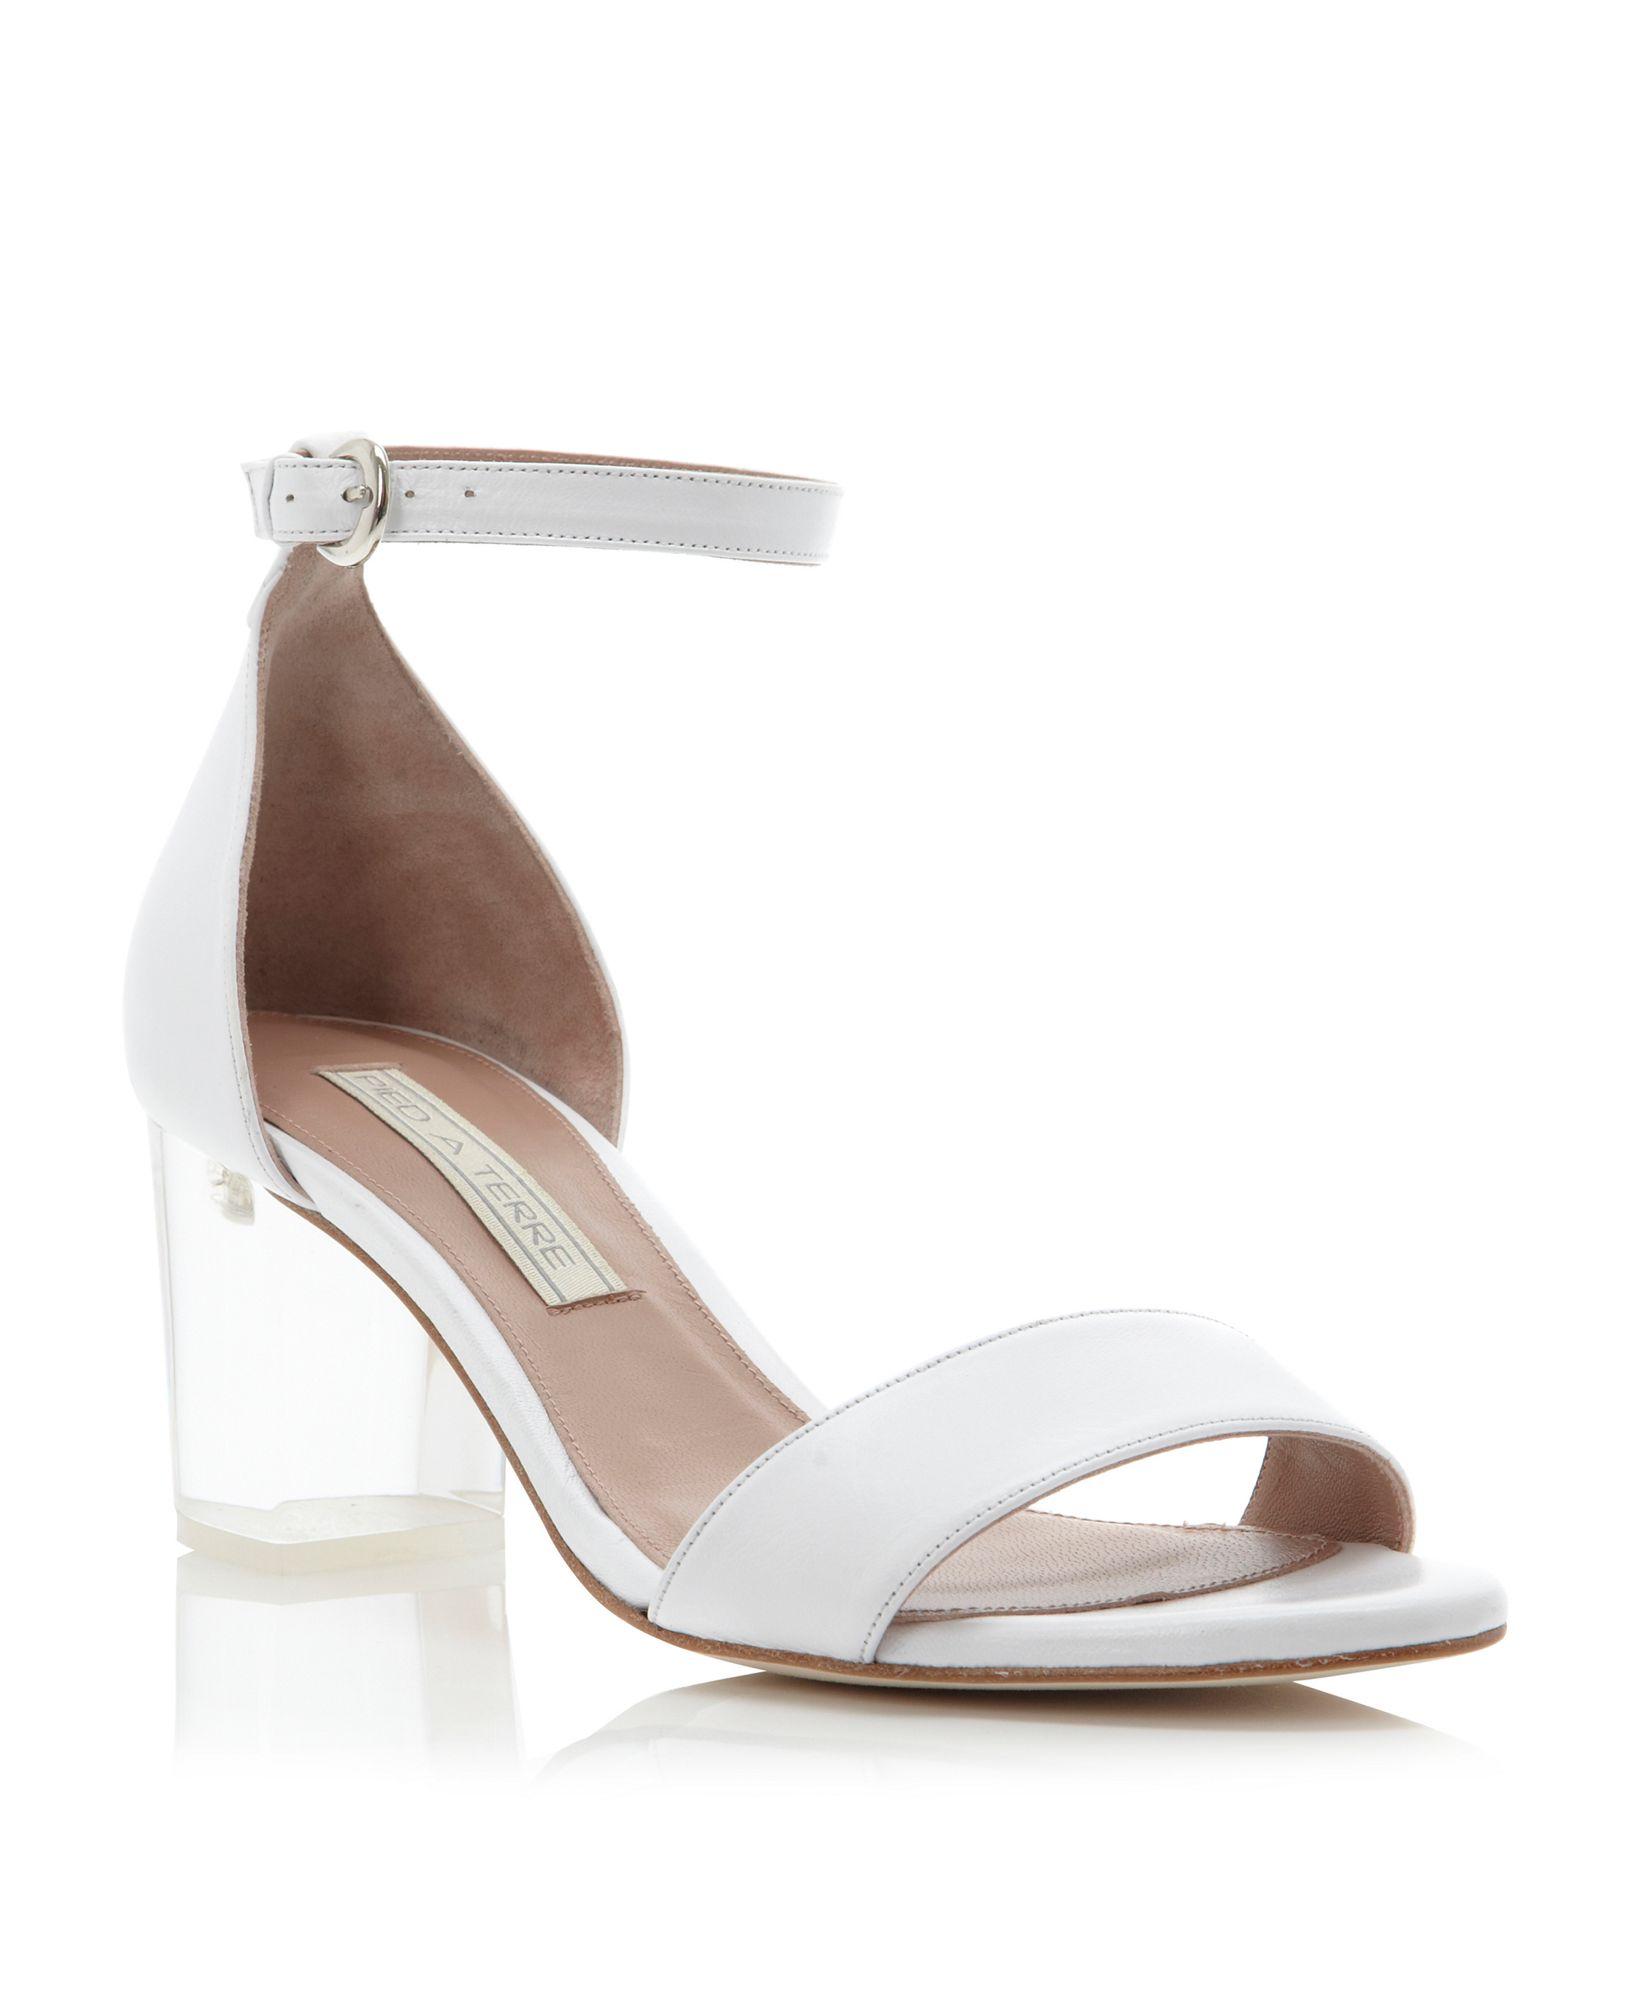 f408dc2ee Lyst - Pied A Terre Jutte Perspex Block Heel Sandals in White